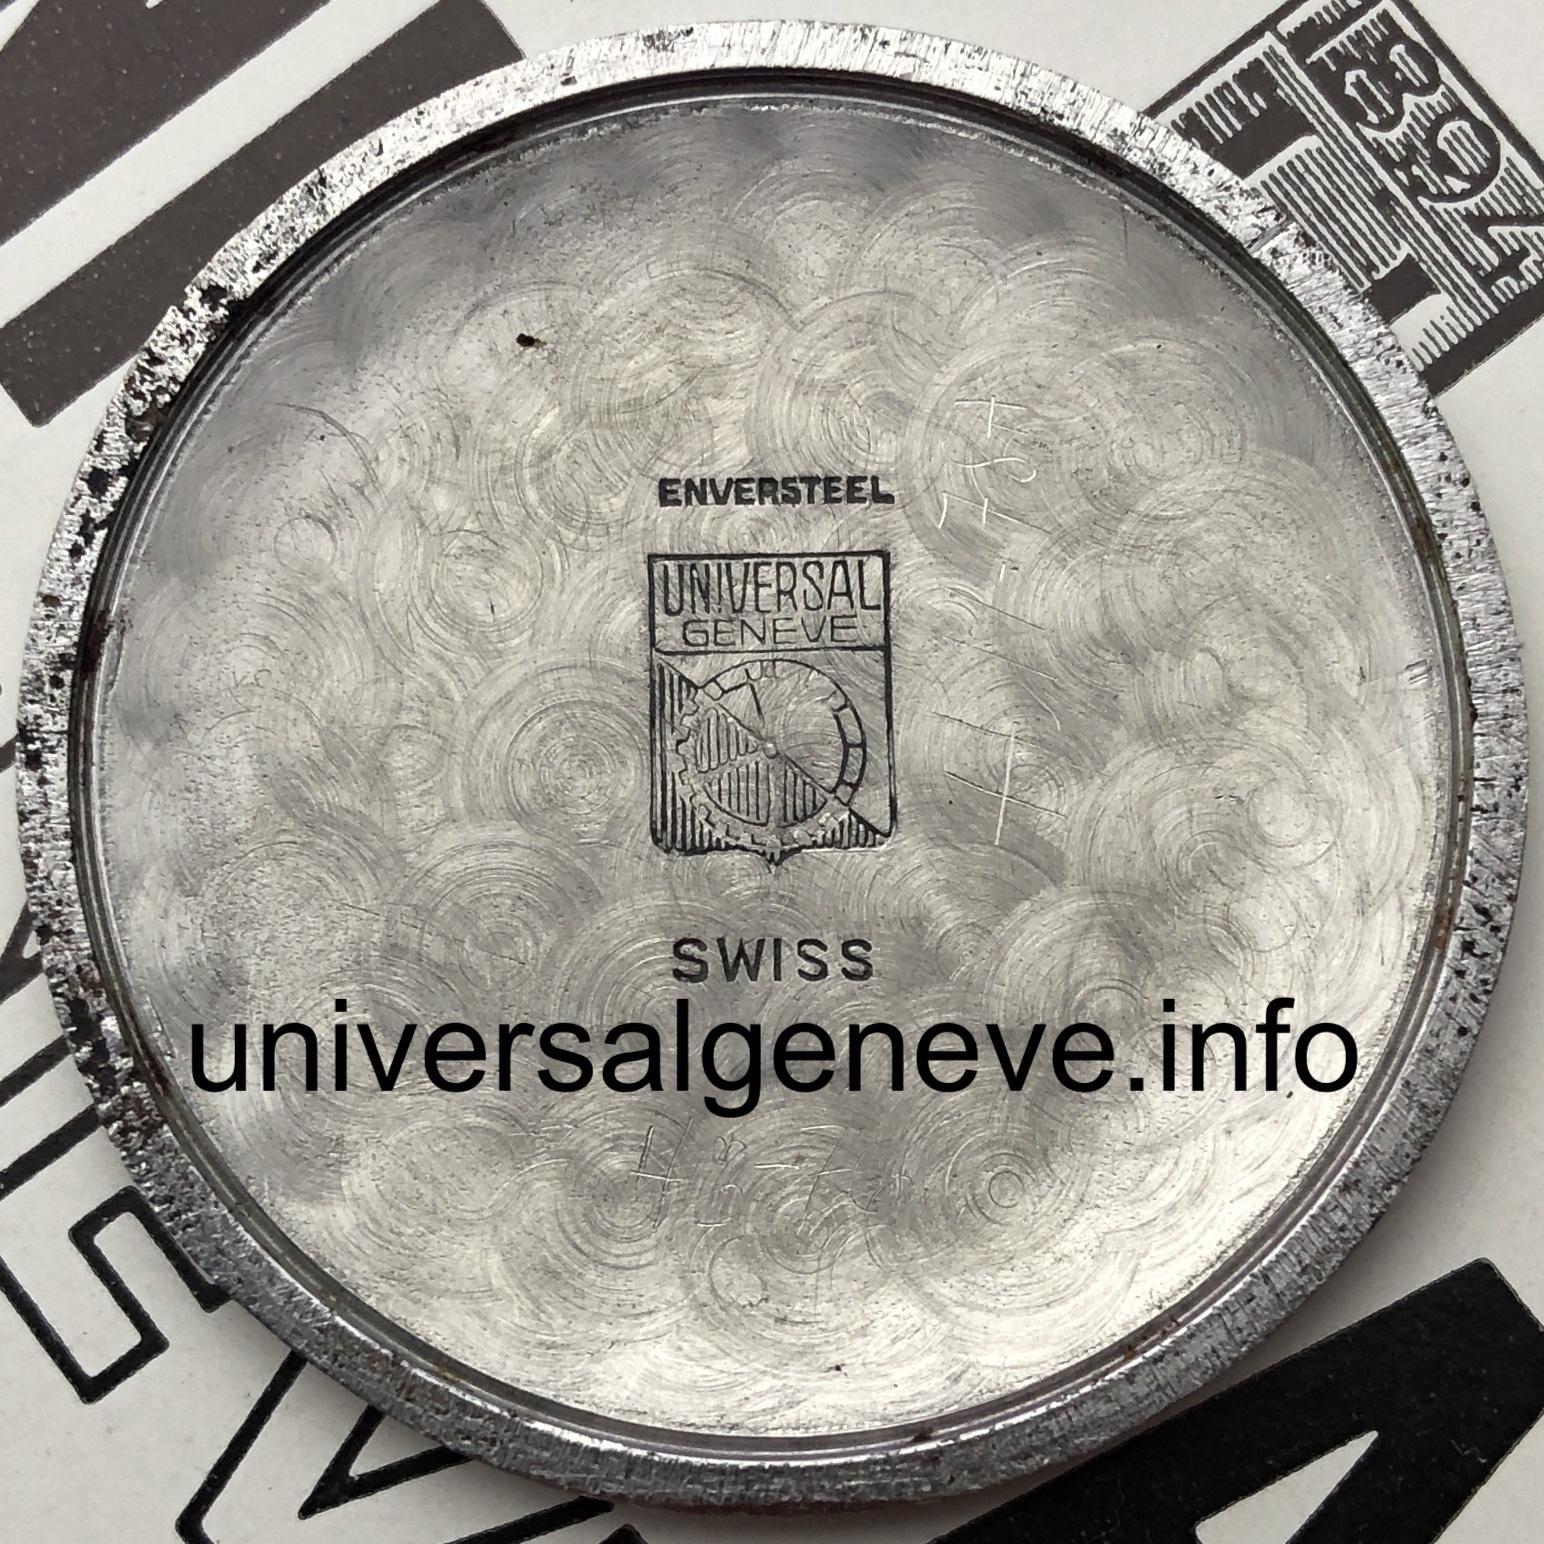 U Shield logo with wheel